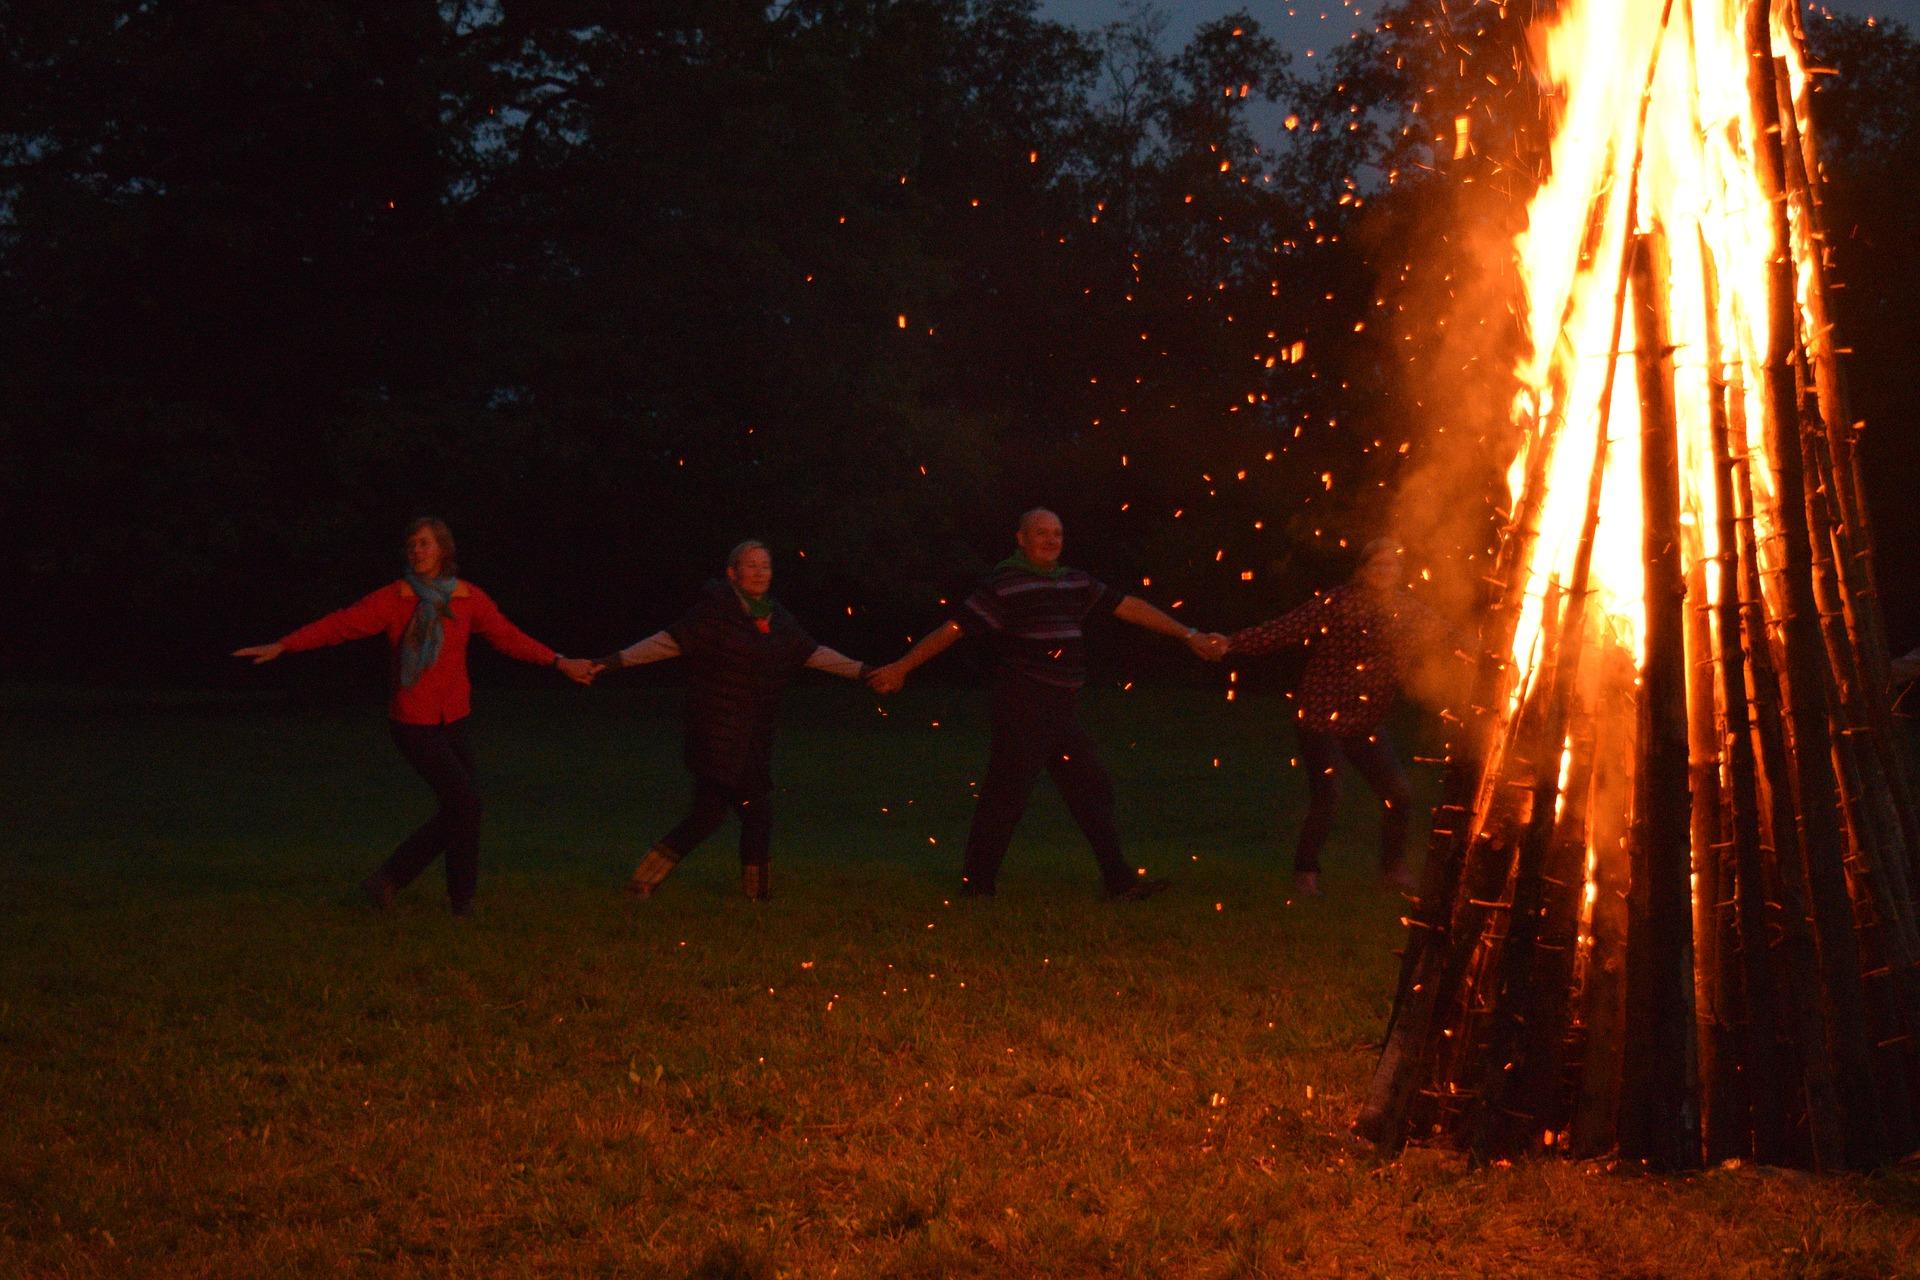 Saturday March 21 - Great fire in Bourdon